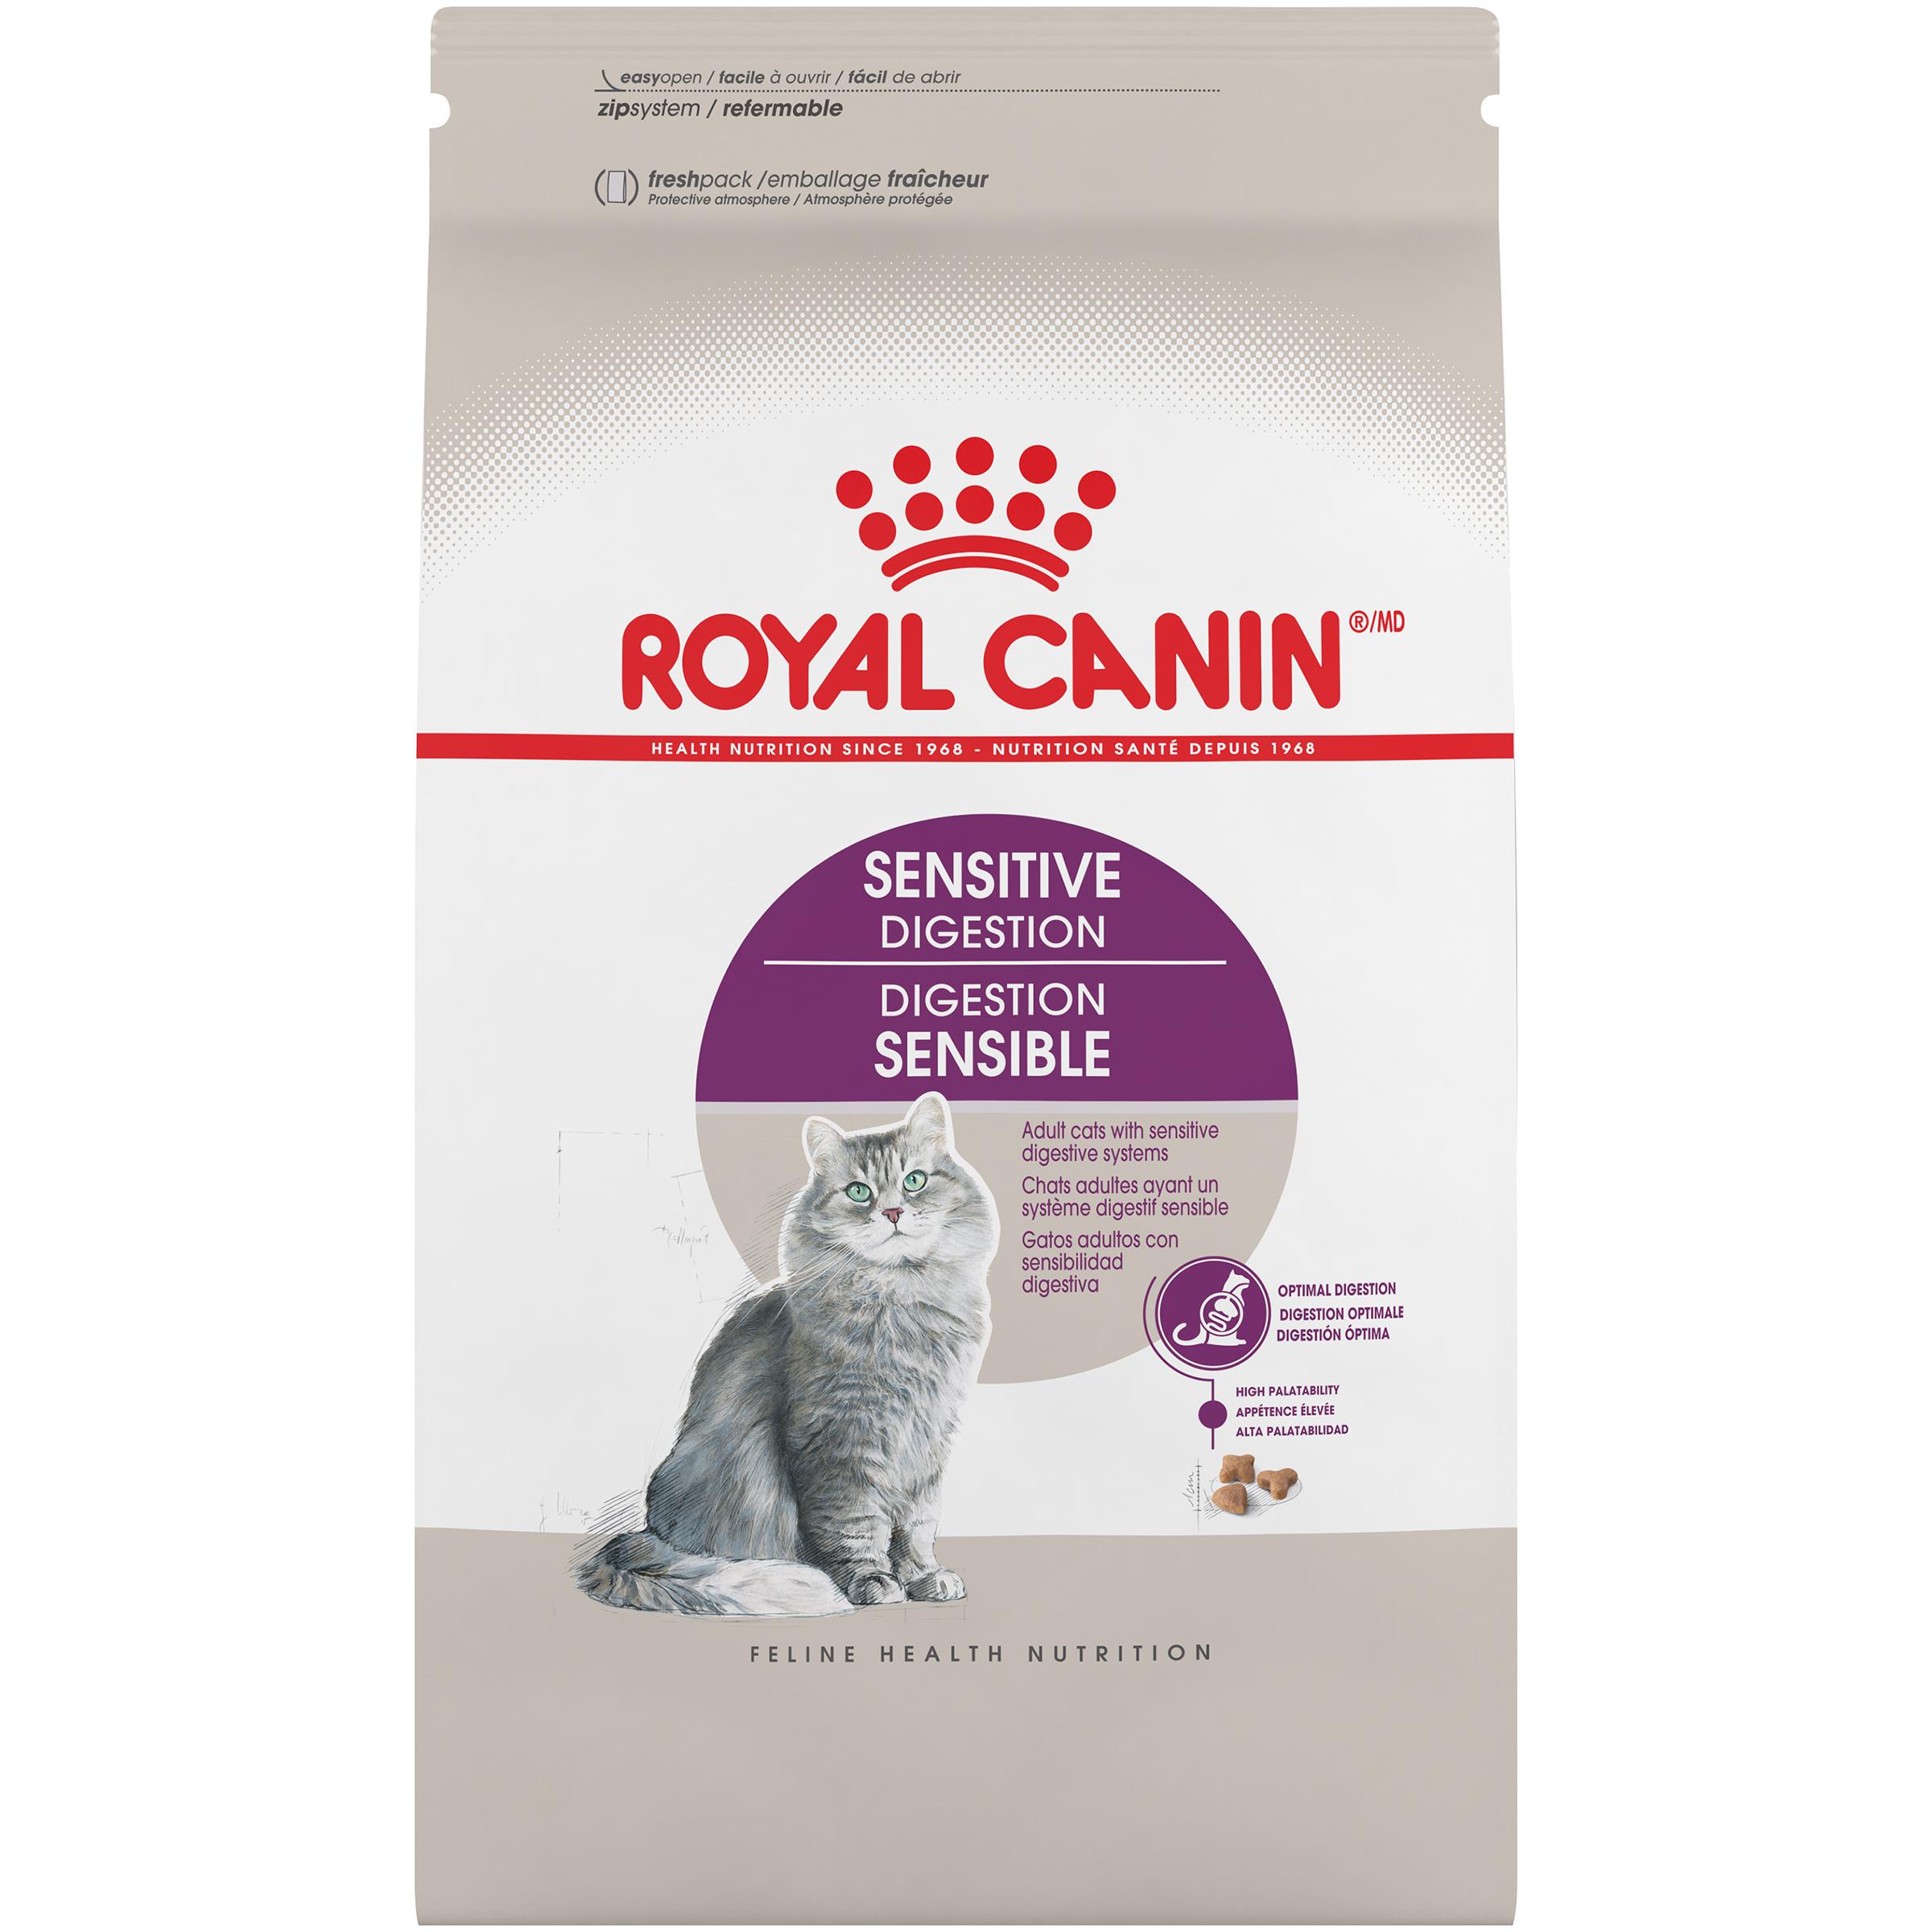 Royal Canin Sensitive Digestion Dry Cat Food Image